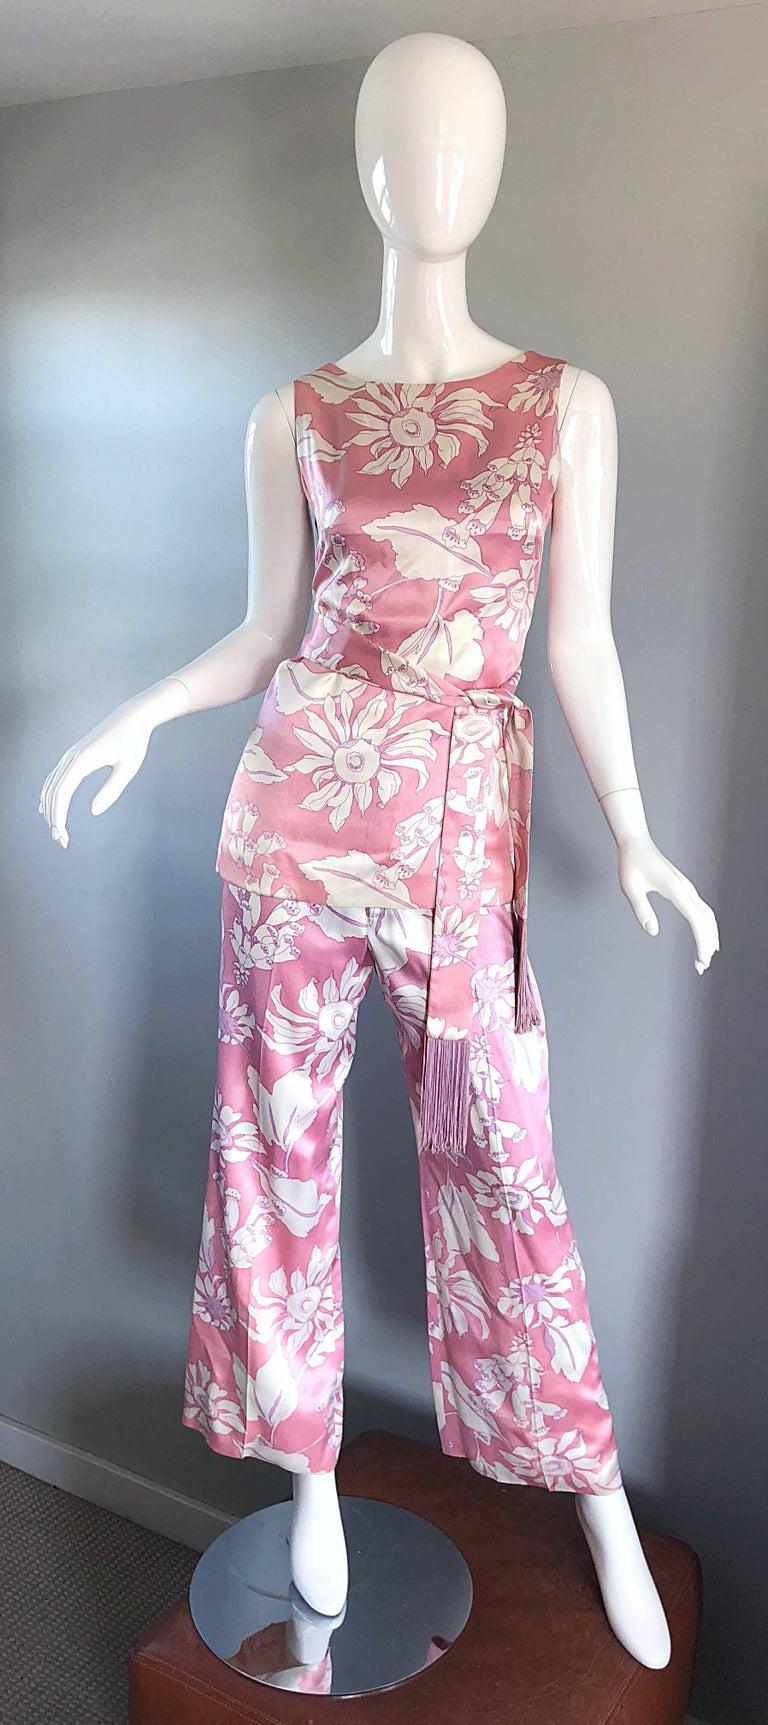 Beige Geoffrey Beene Vintage 1970s Pink + White Four Piece Silk Pants Top Belt & Shawl For Sale